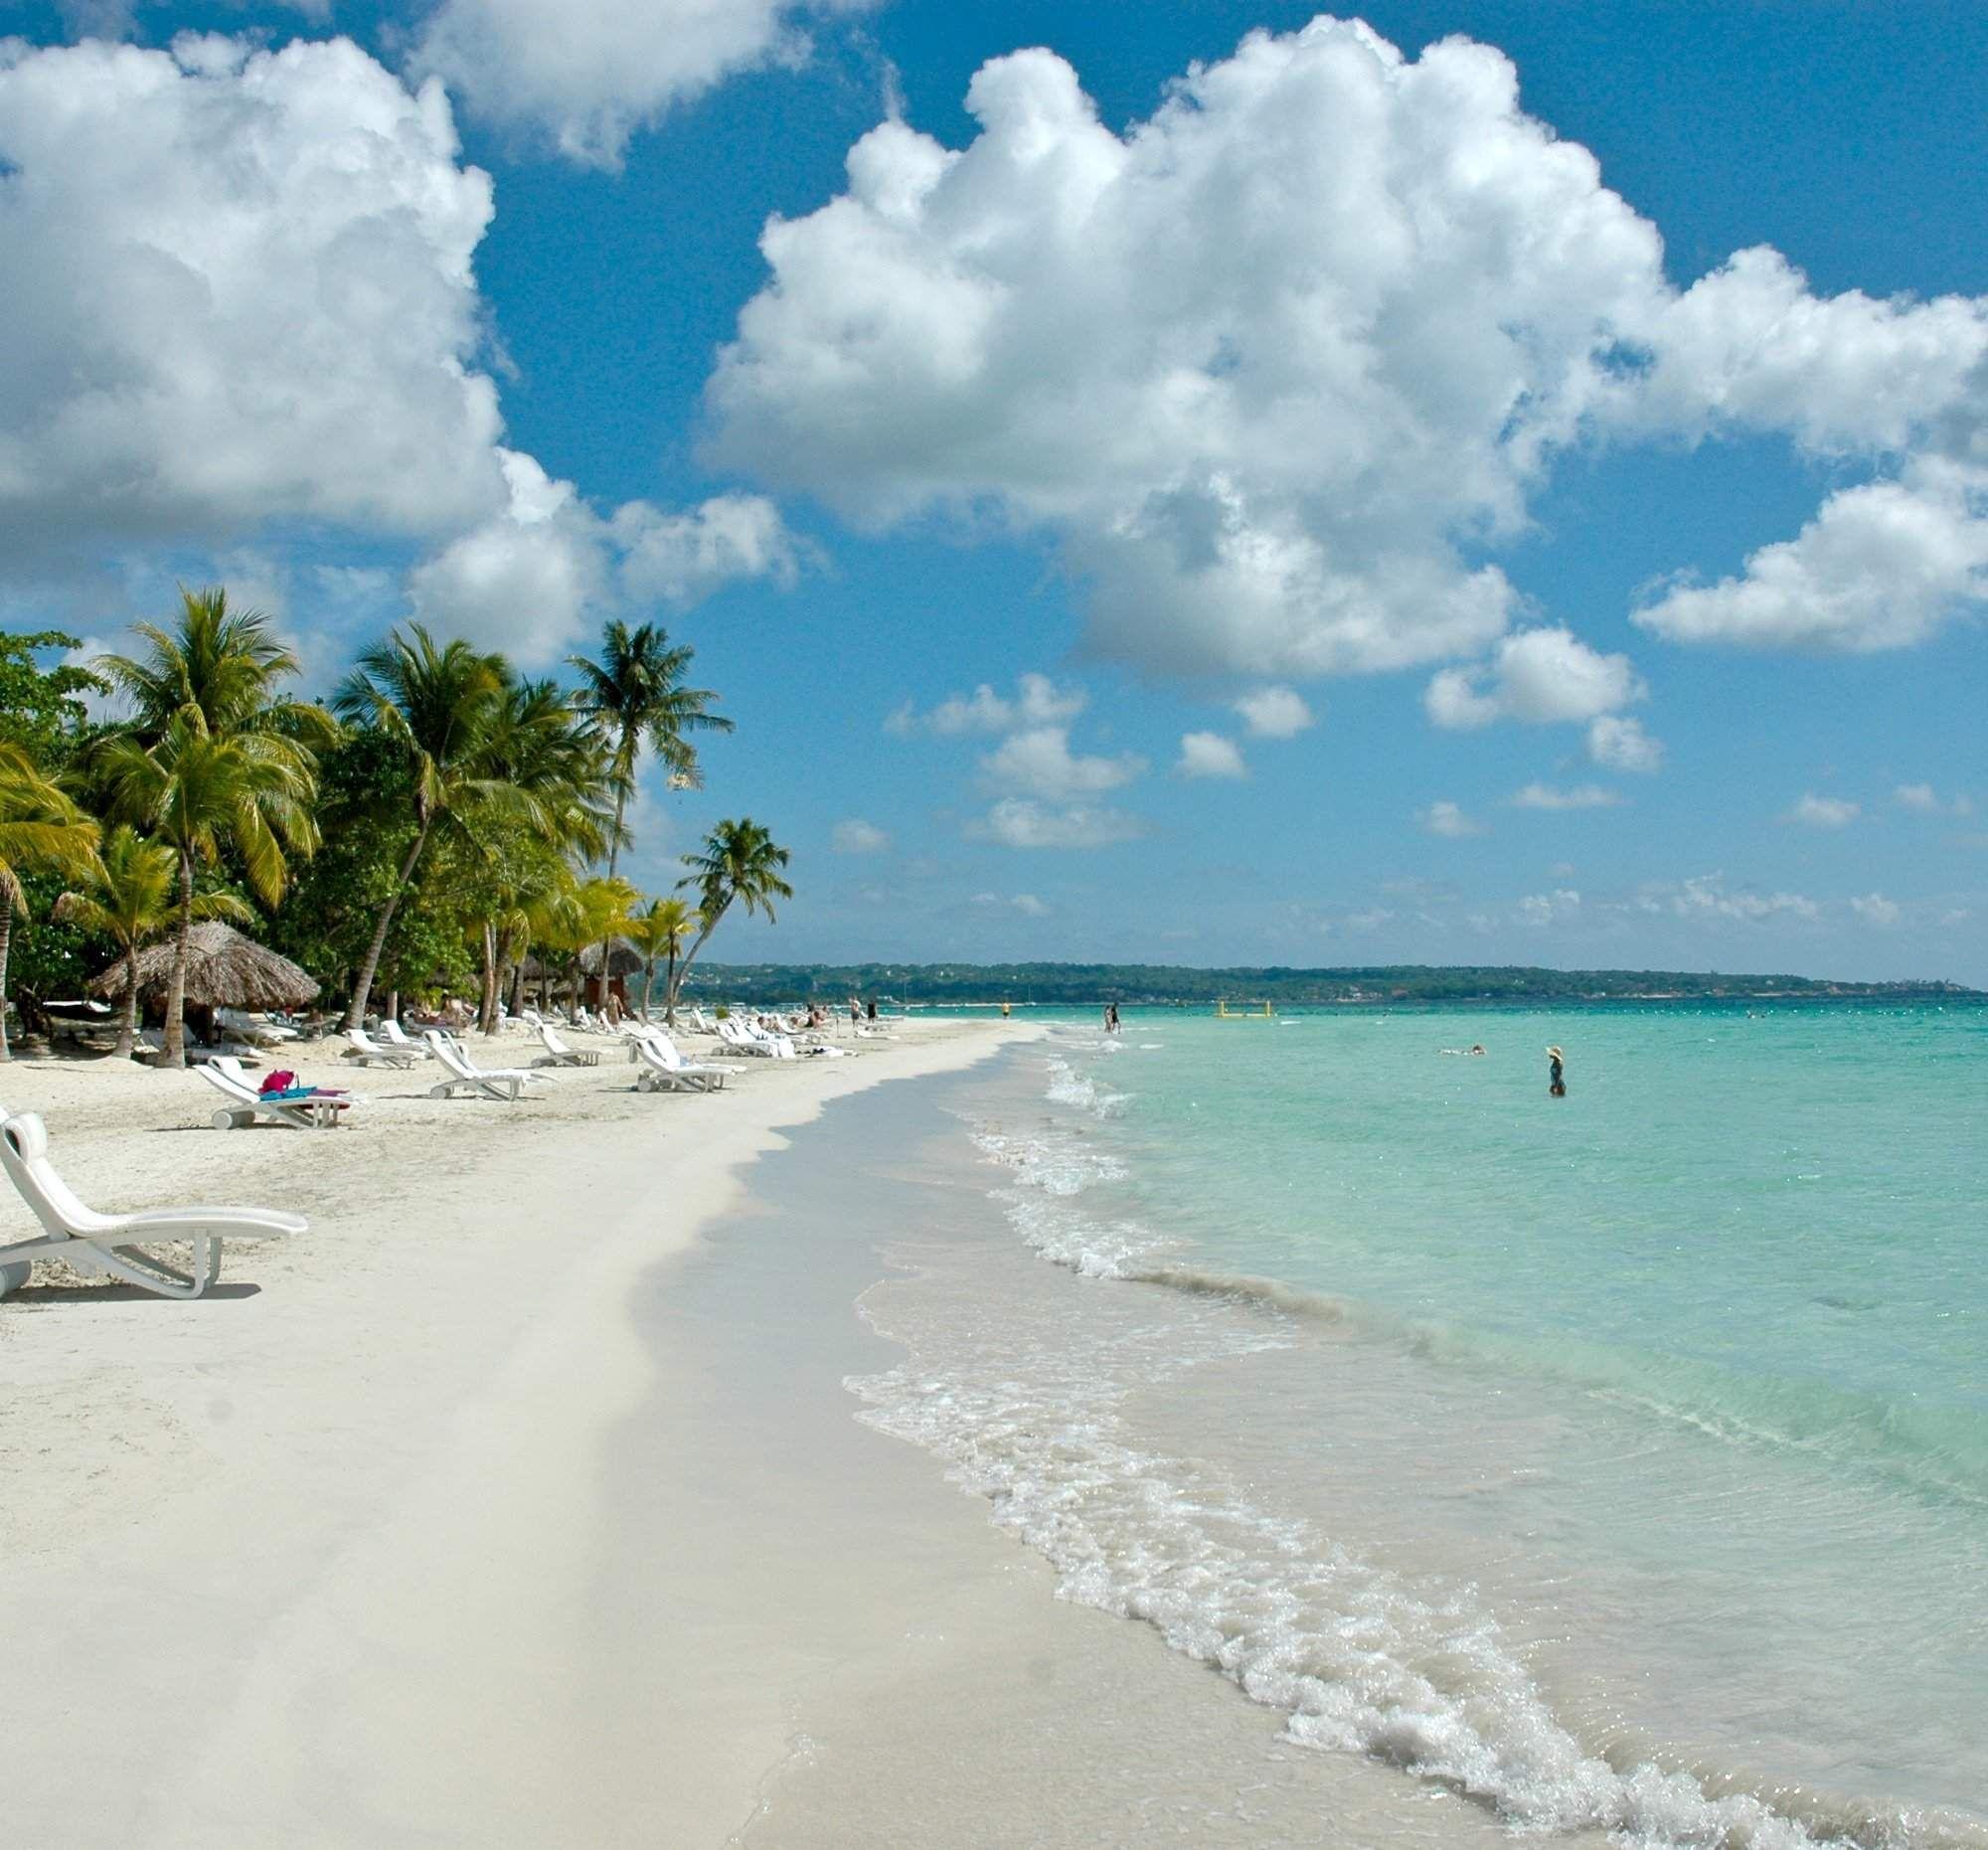 Best Place For Vacation Jamaica: Best 25+ Jamaica Beach Ideas On Pinterest